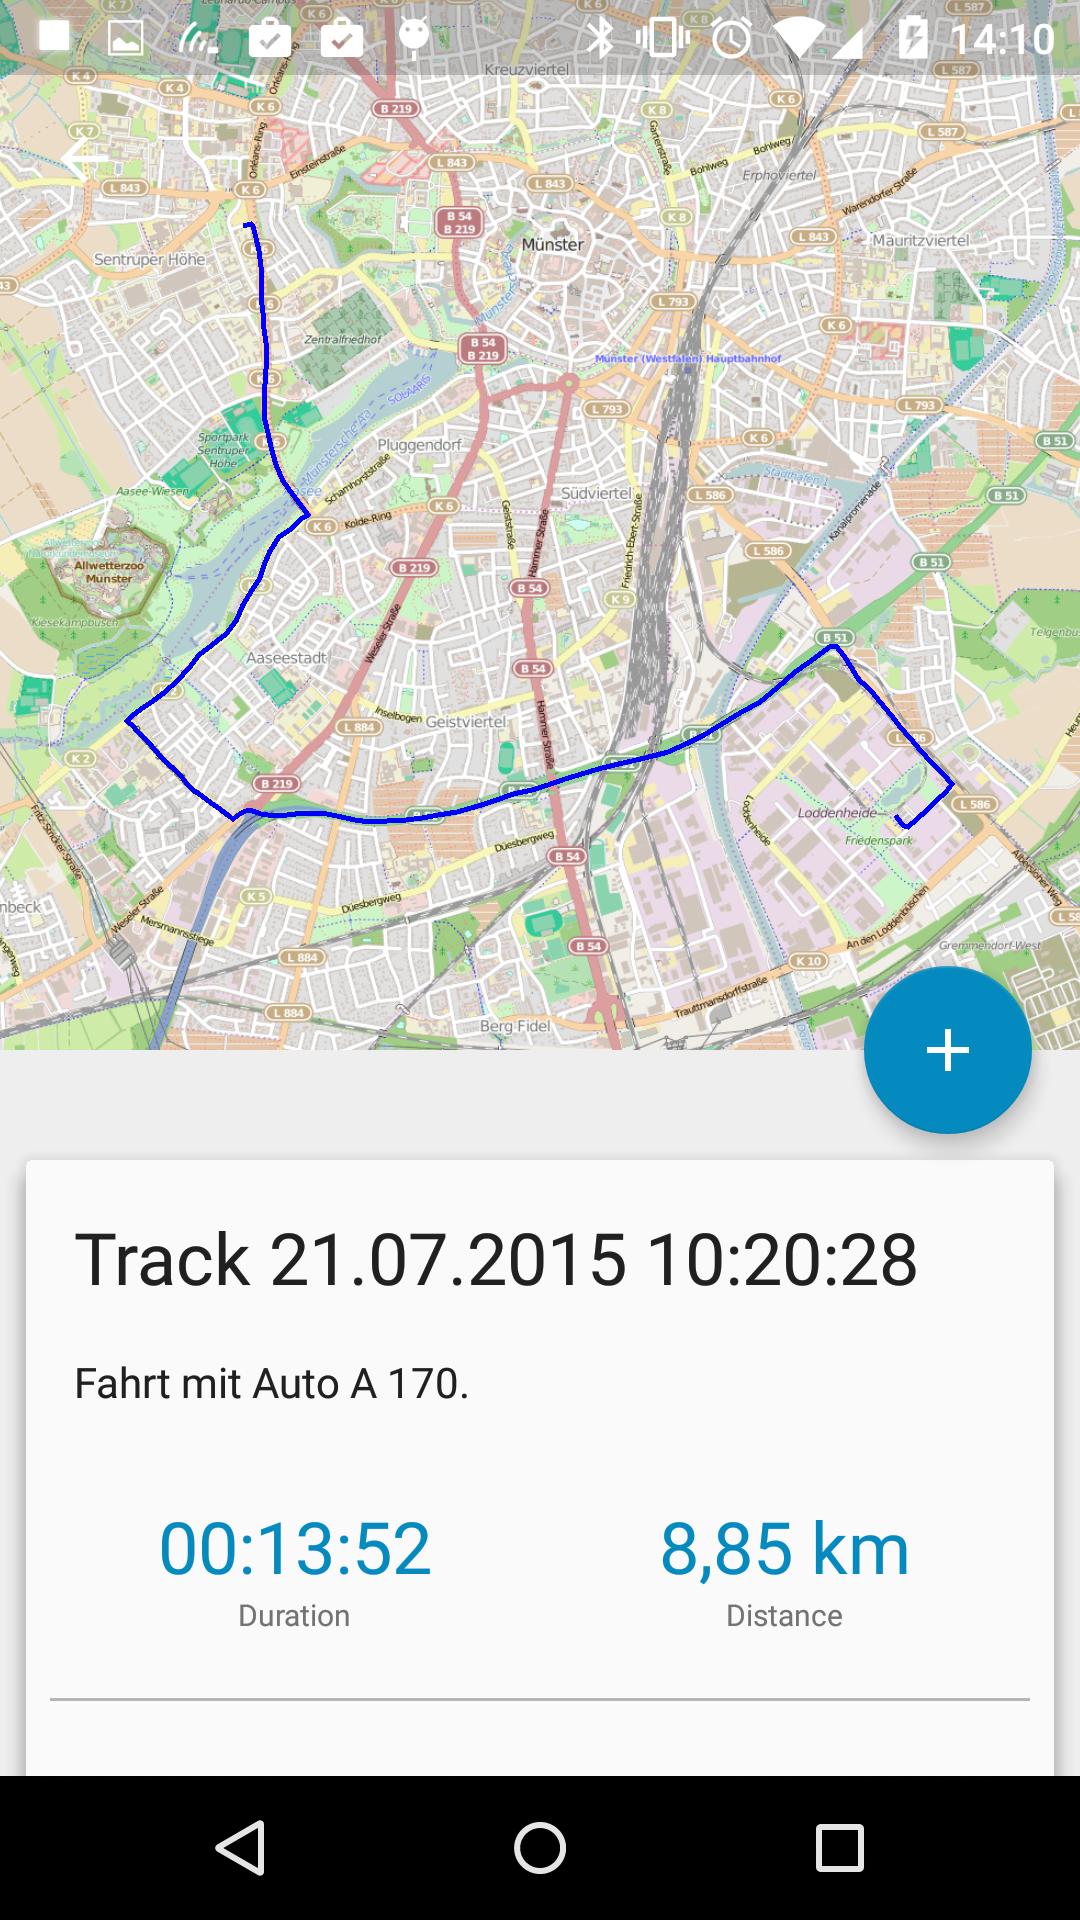 trackdetails_1.png